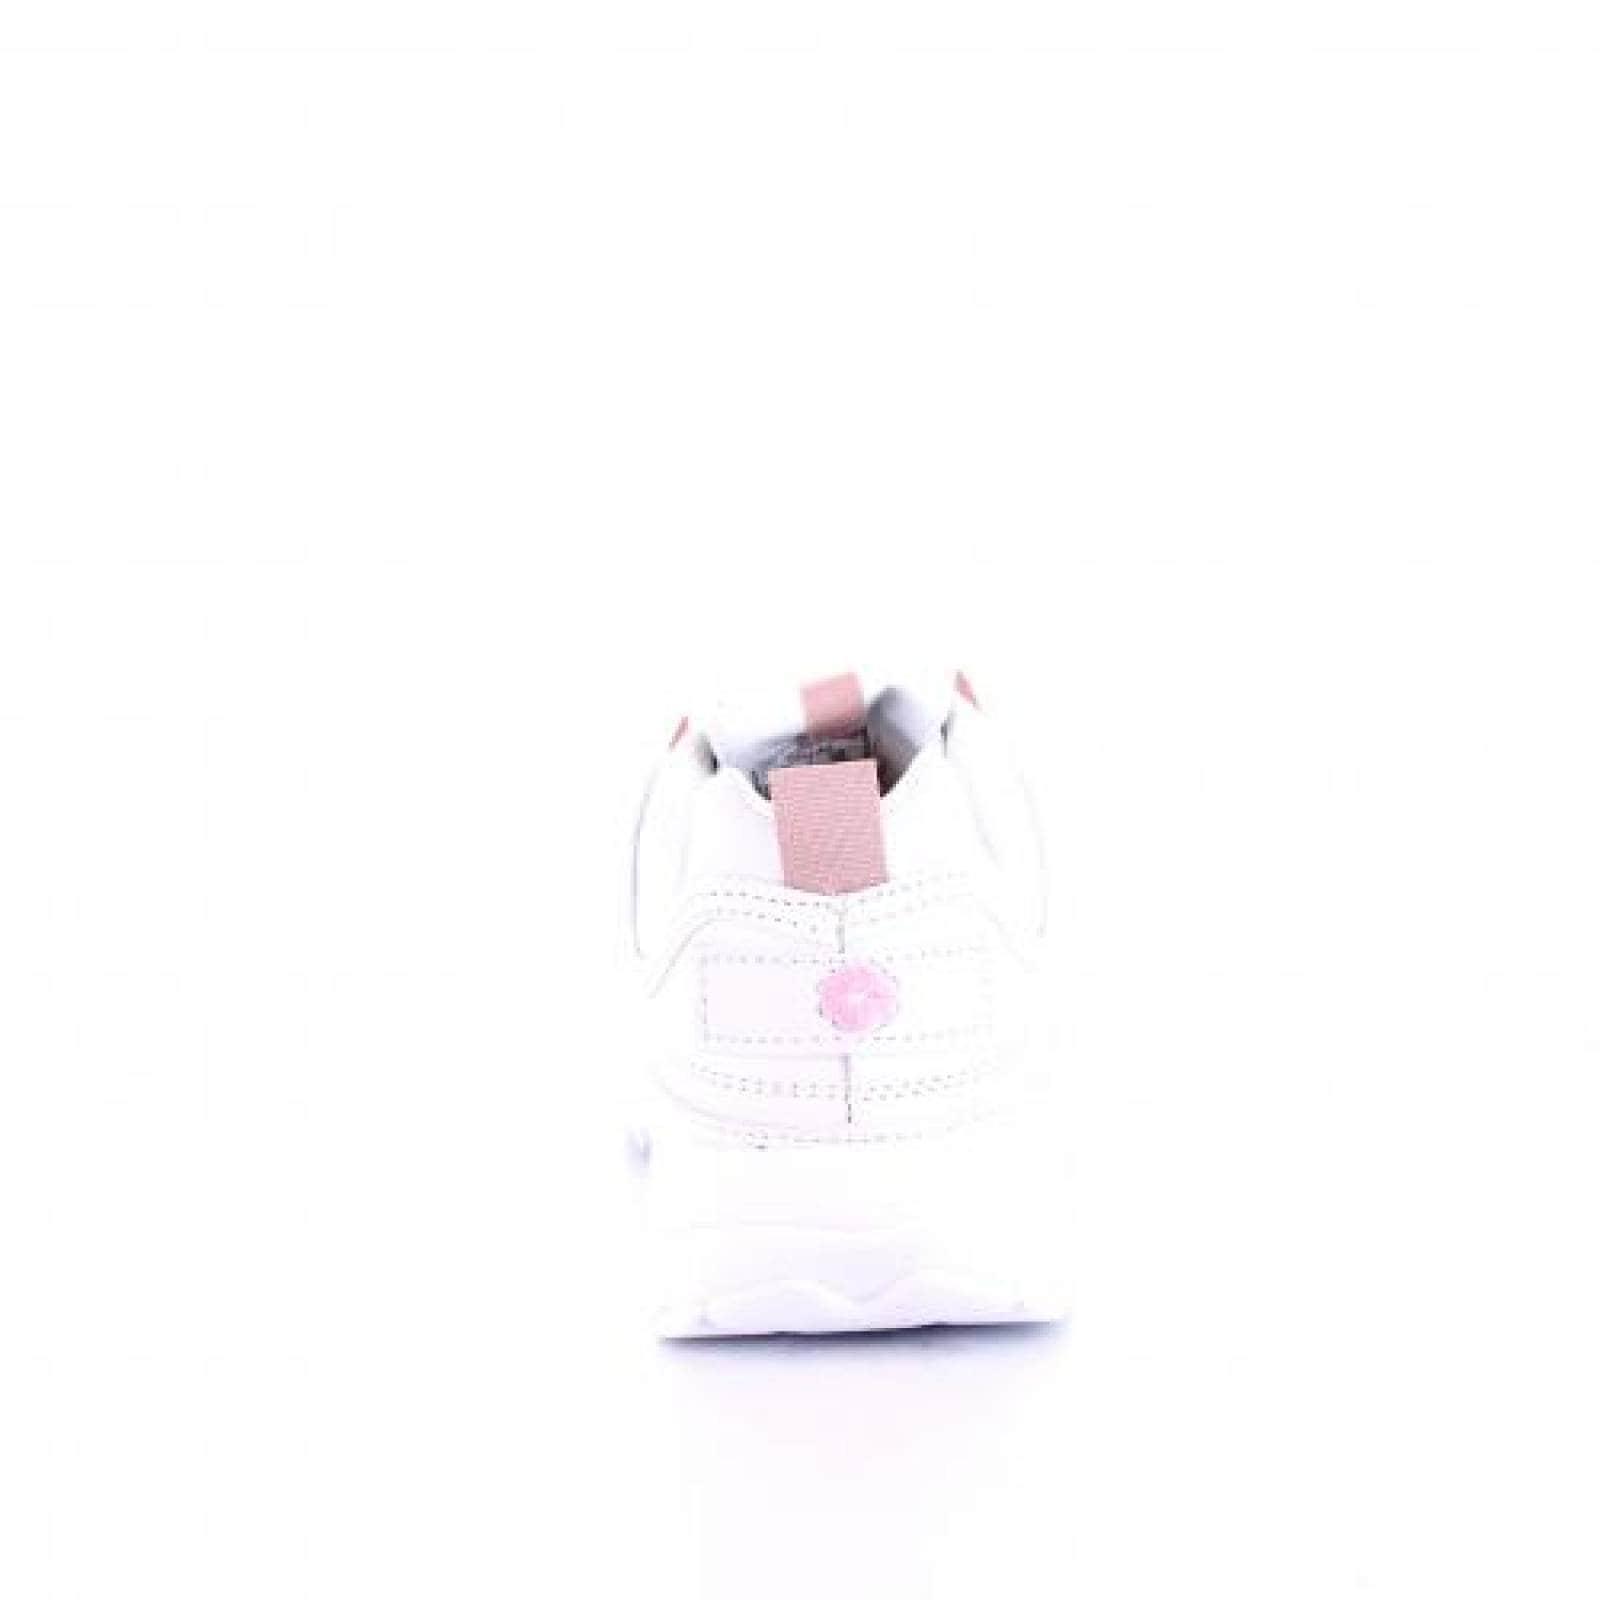 Tenis para Mujer Redberry 12007 054195 Color Blanco Rosa